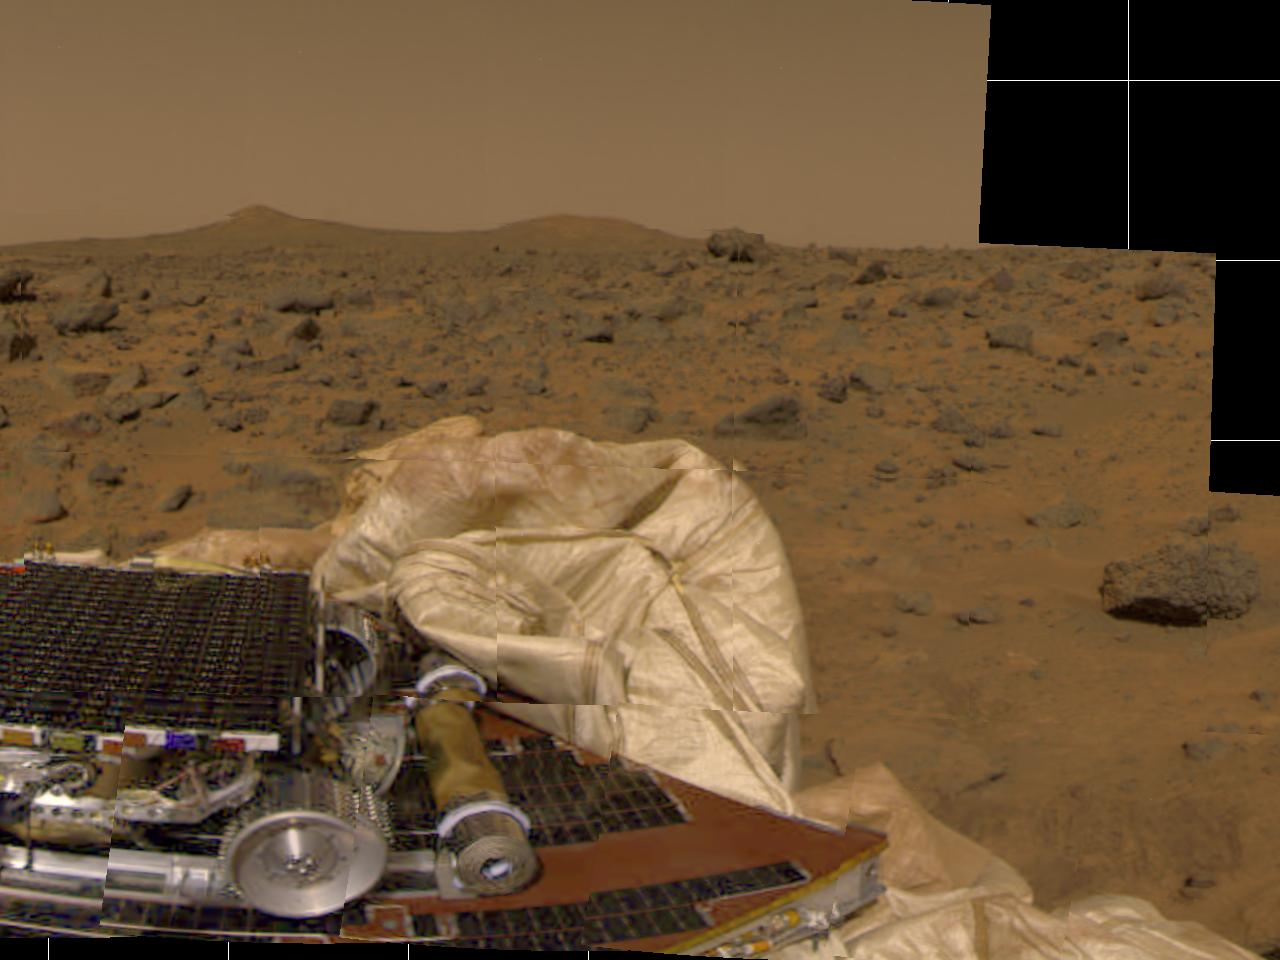 Mars Pathfinder Historical Images